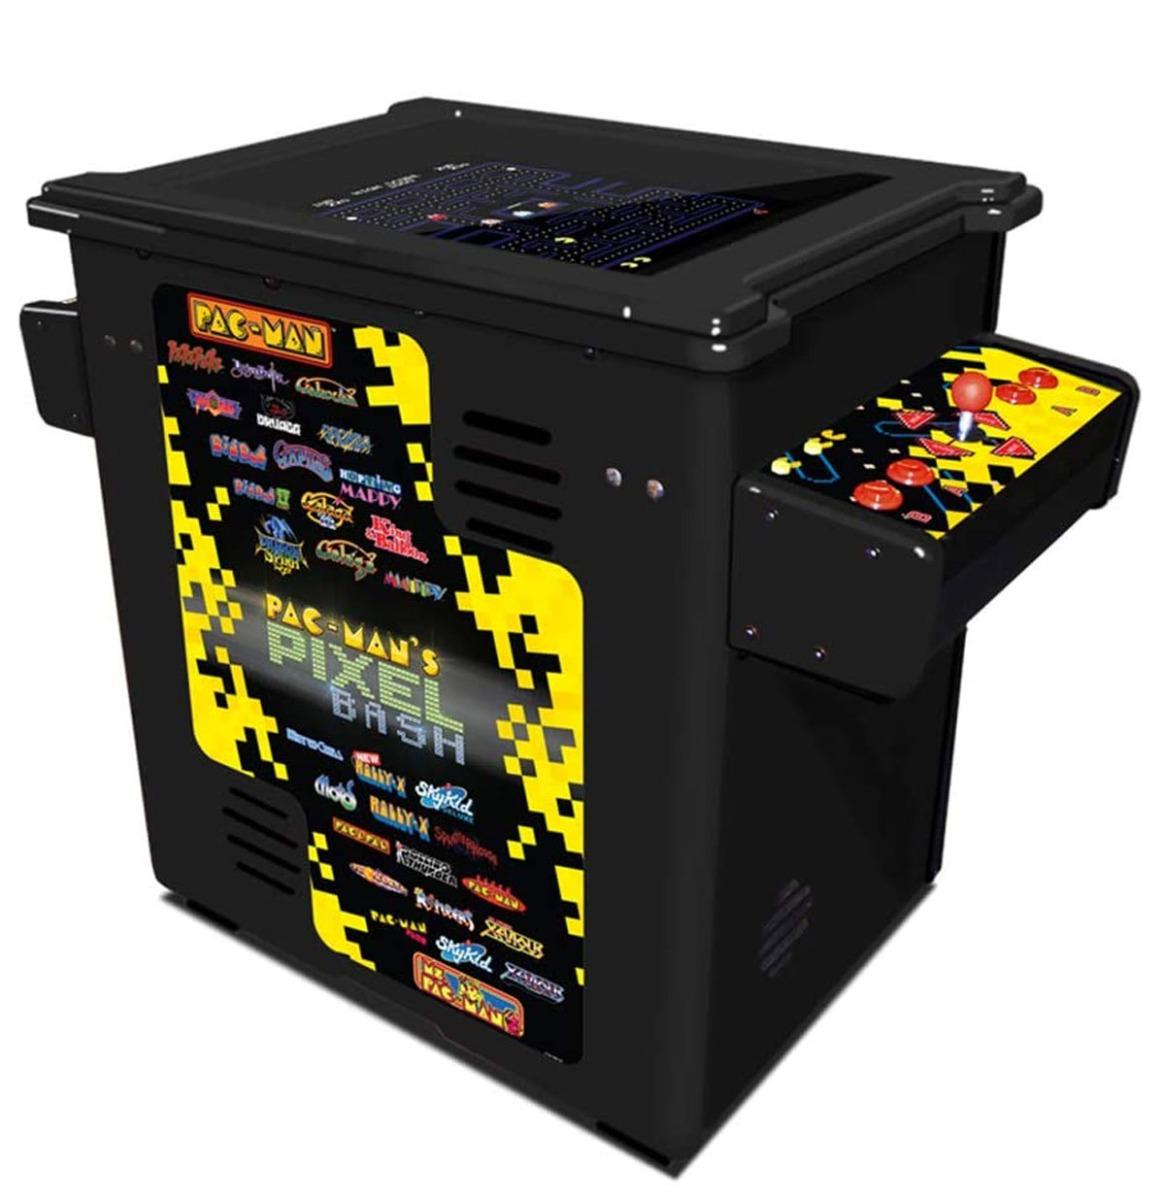 Namco Pac-Man Pixel Bash Cocktail Tafel Thuis Editie - Zwart 32 Spellen